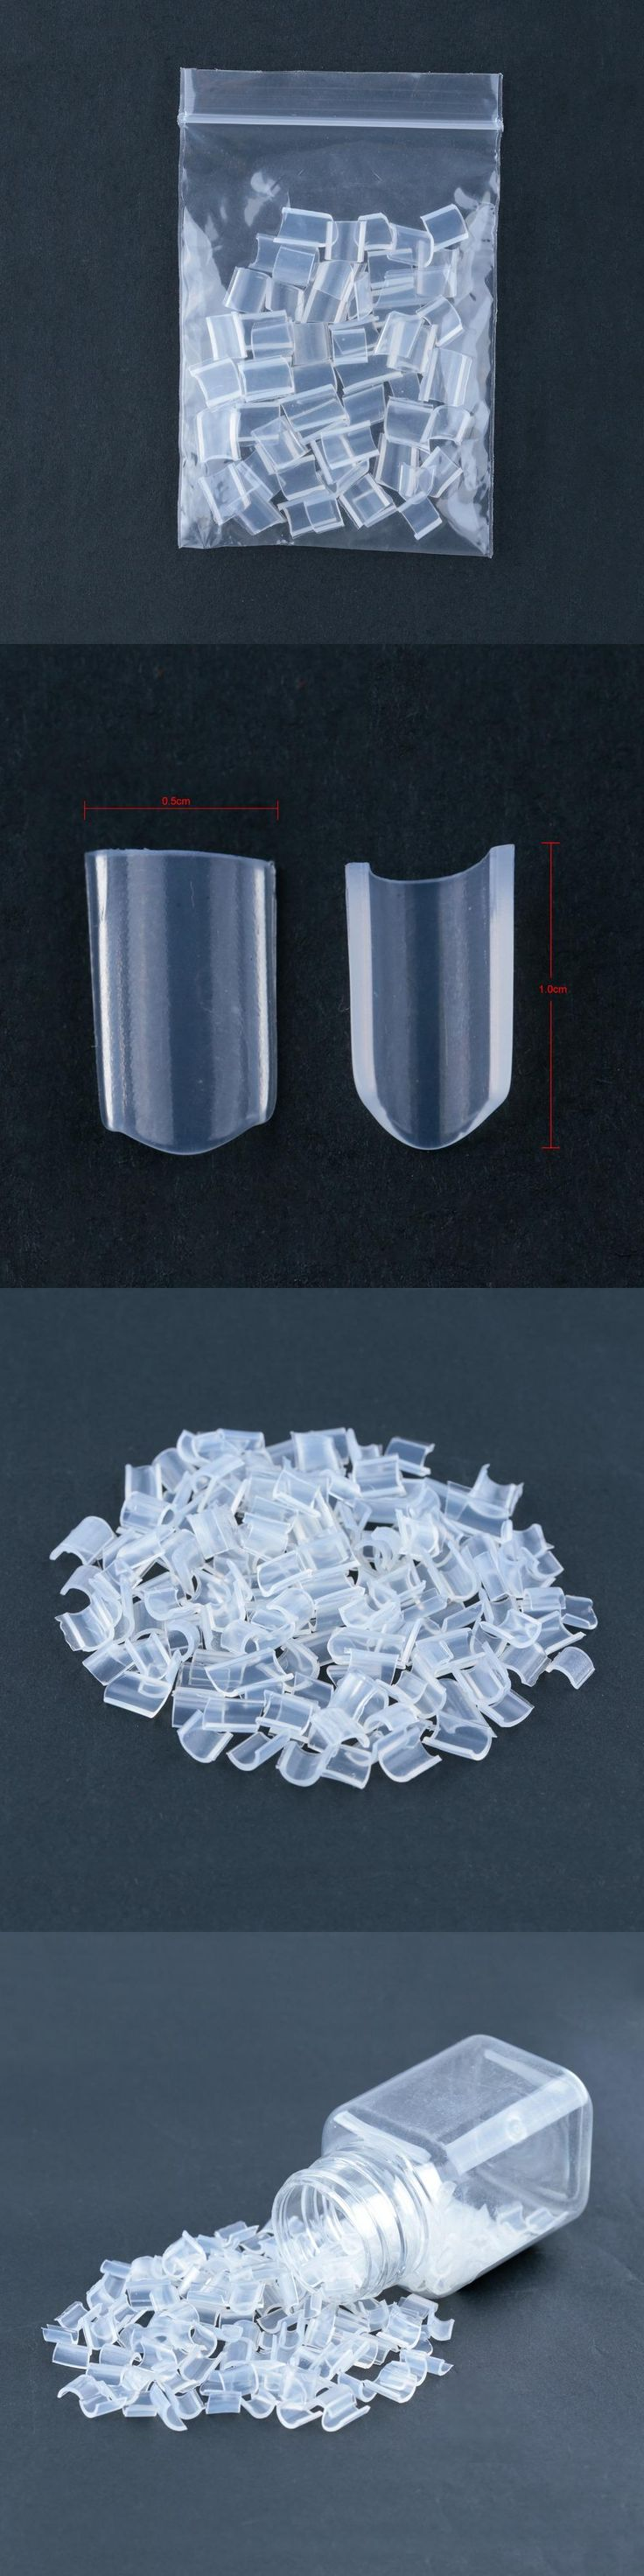 Neitsi Keratin Glue Nail U Shaped Tip For Fusion Keratin U Tip Hair Extensions White 50pcs/pack